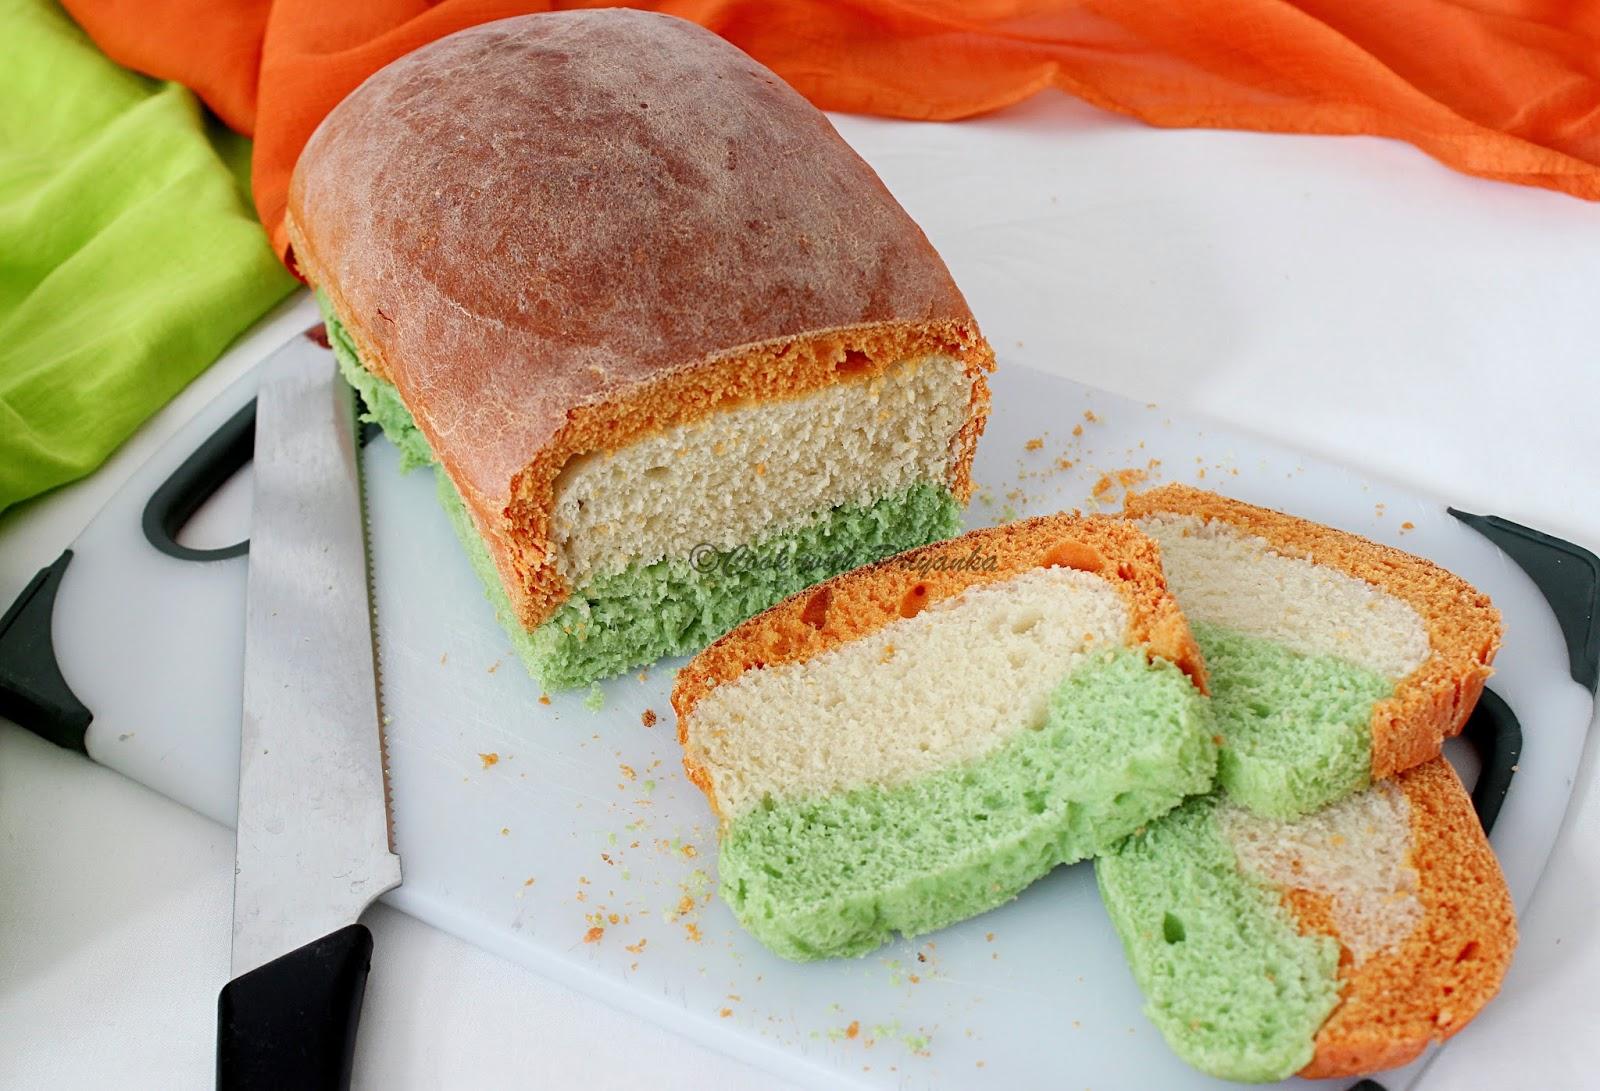 http://cookwithpriyankavarma.blogspot.co.uk/2014/08/tiranga-bread-independence-day-special.html